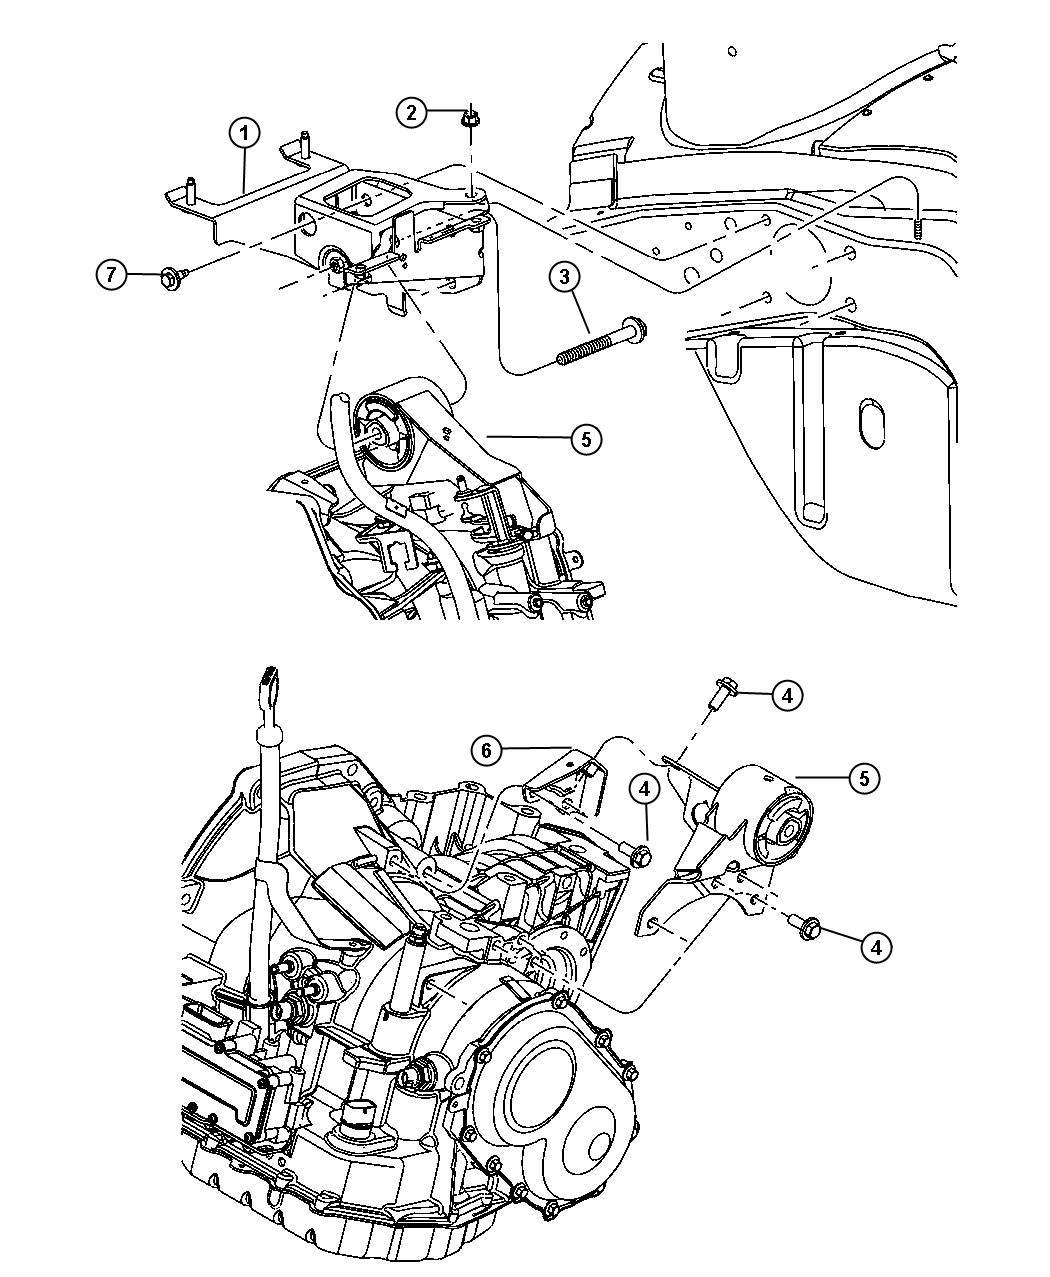 2001 Dodge Neon Transmission.